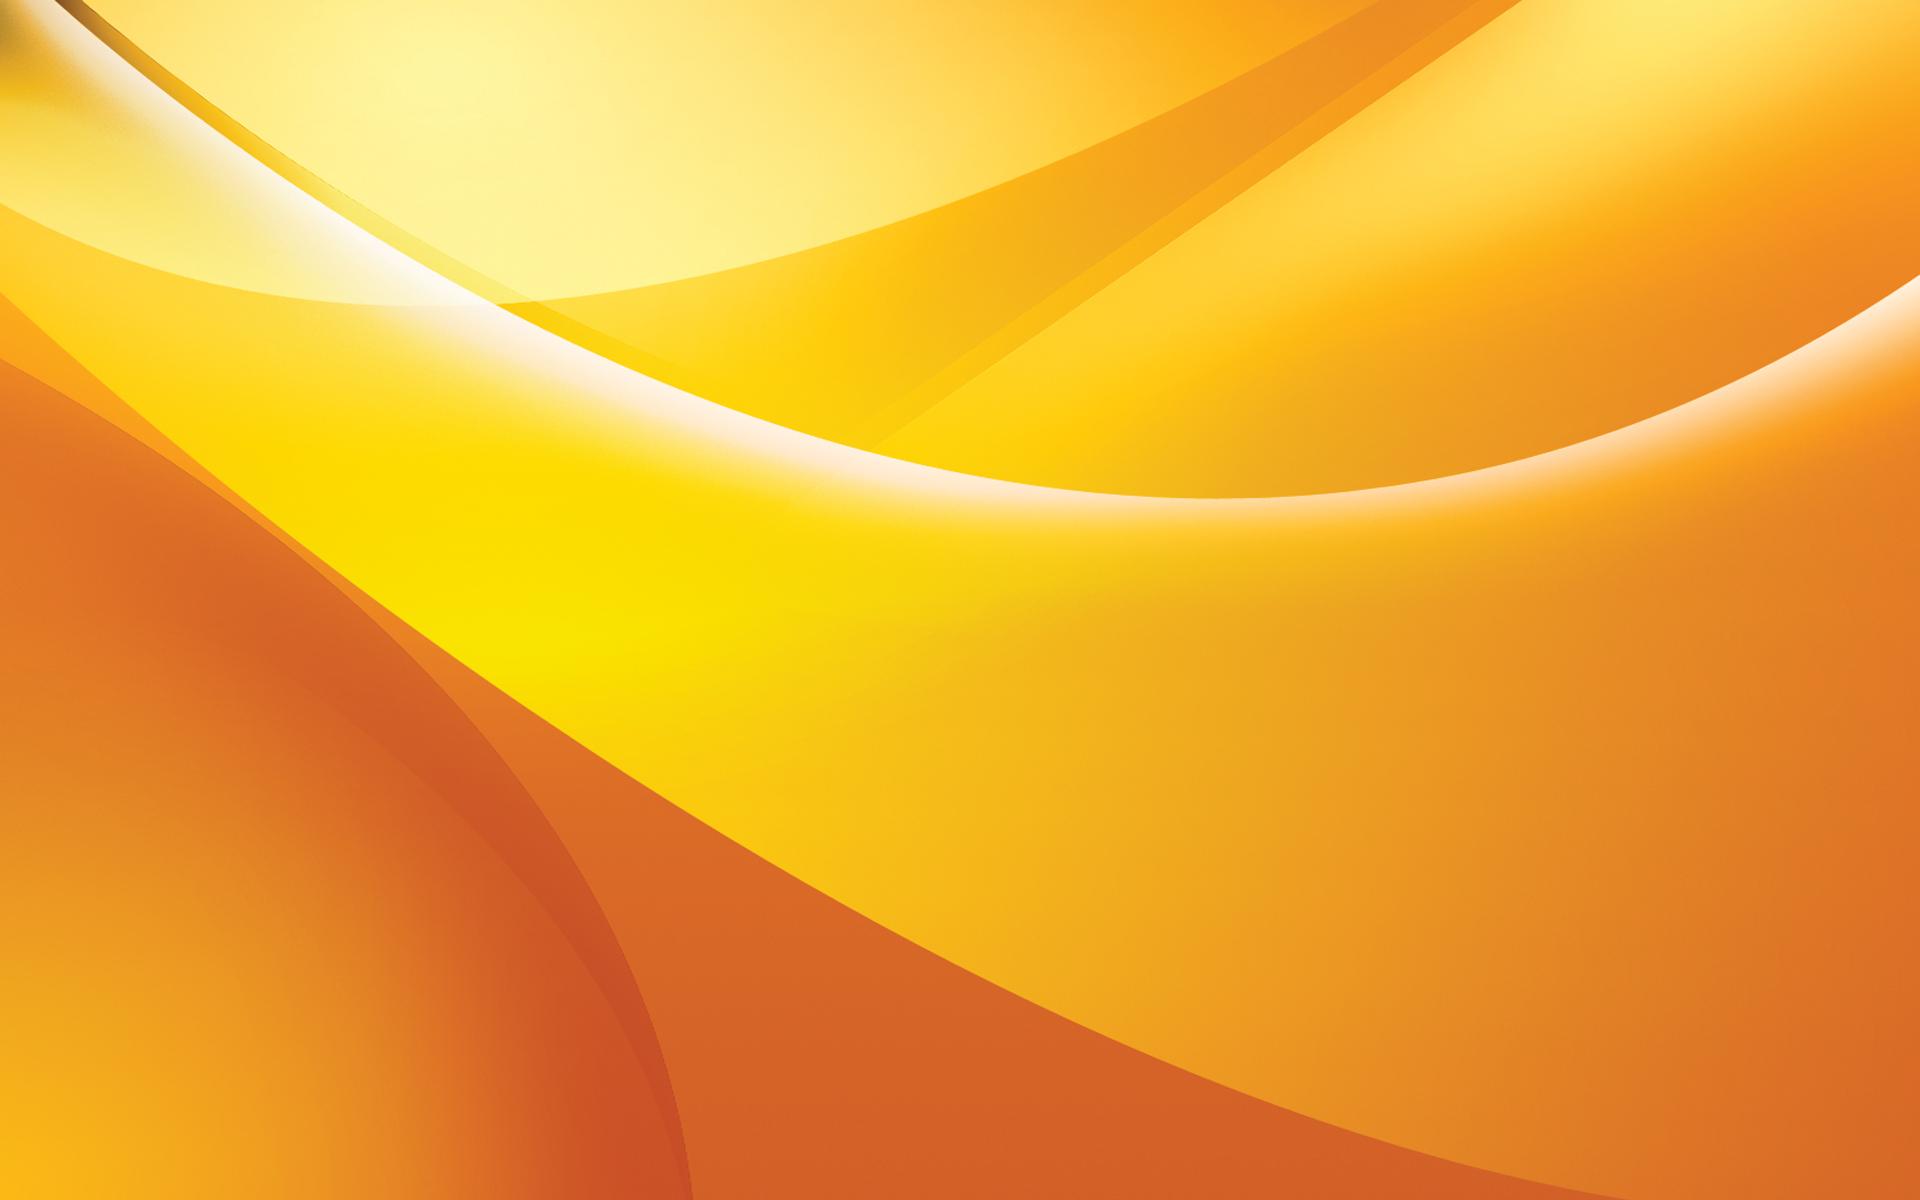 Orange curve wallpaper Wallpaper Wide HD 1920x1200